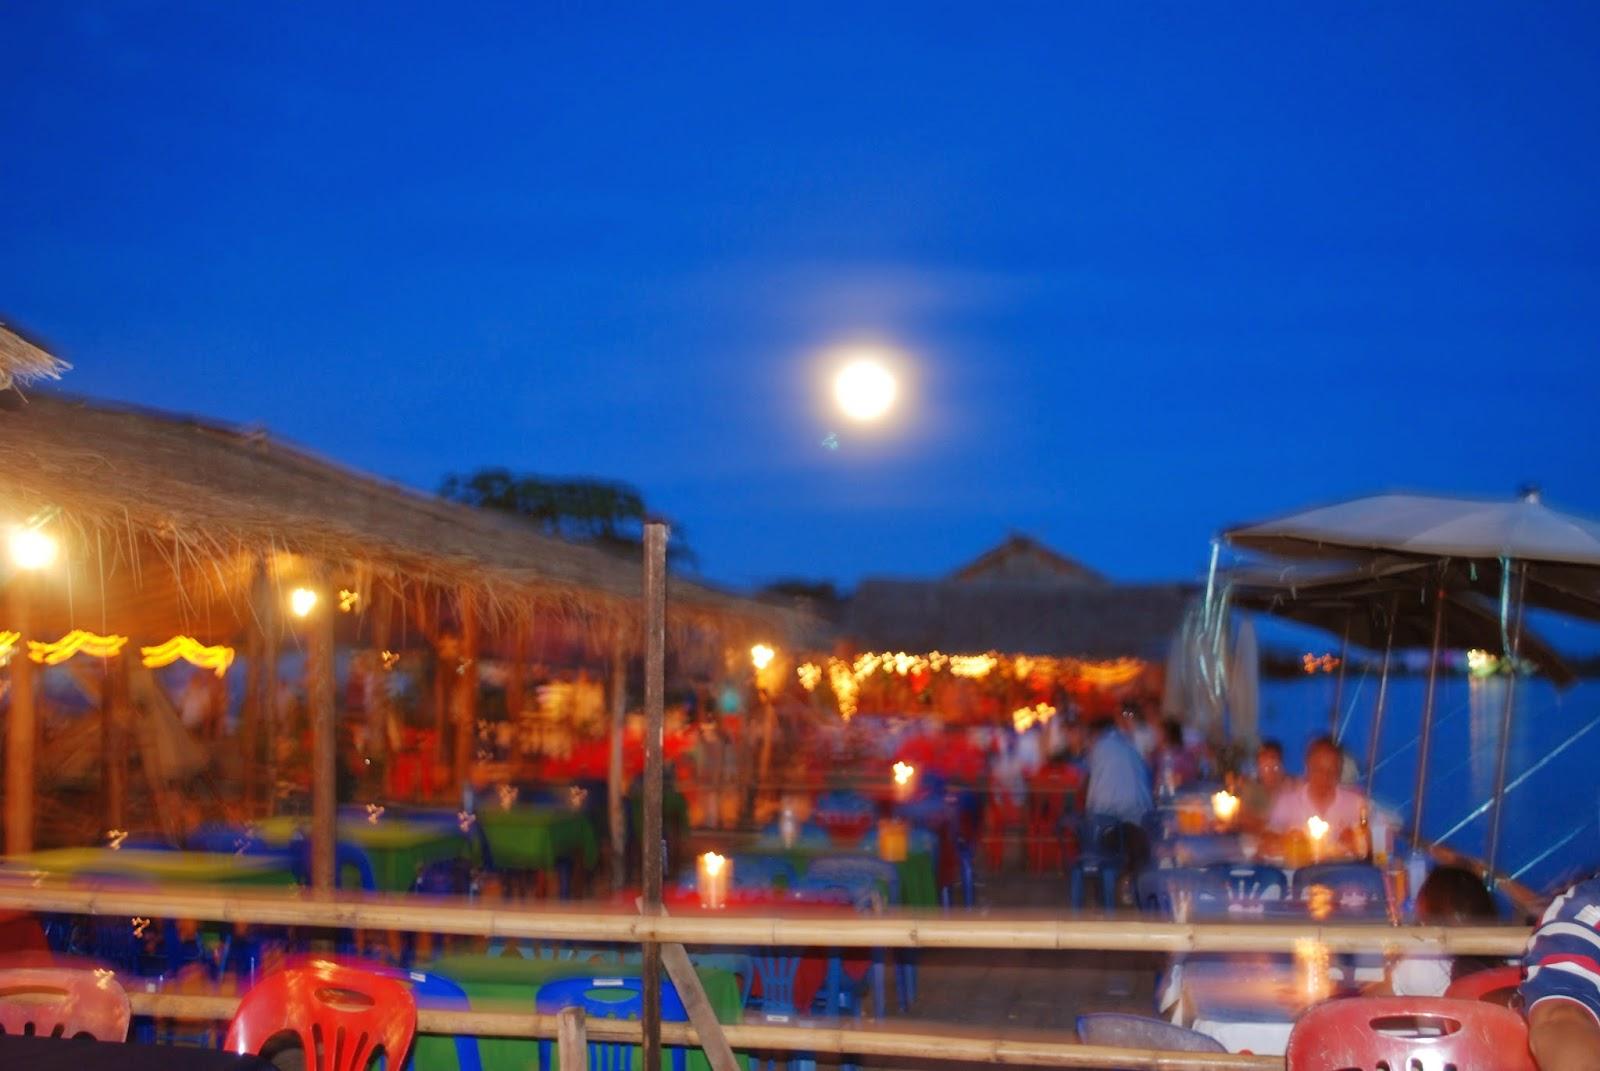 Vientiane-Laos-night-market